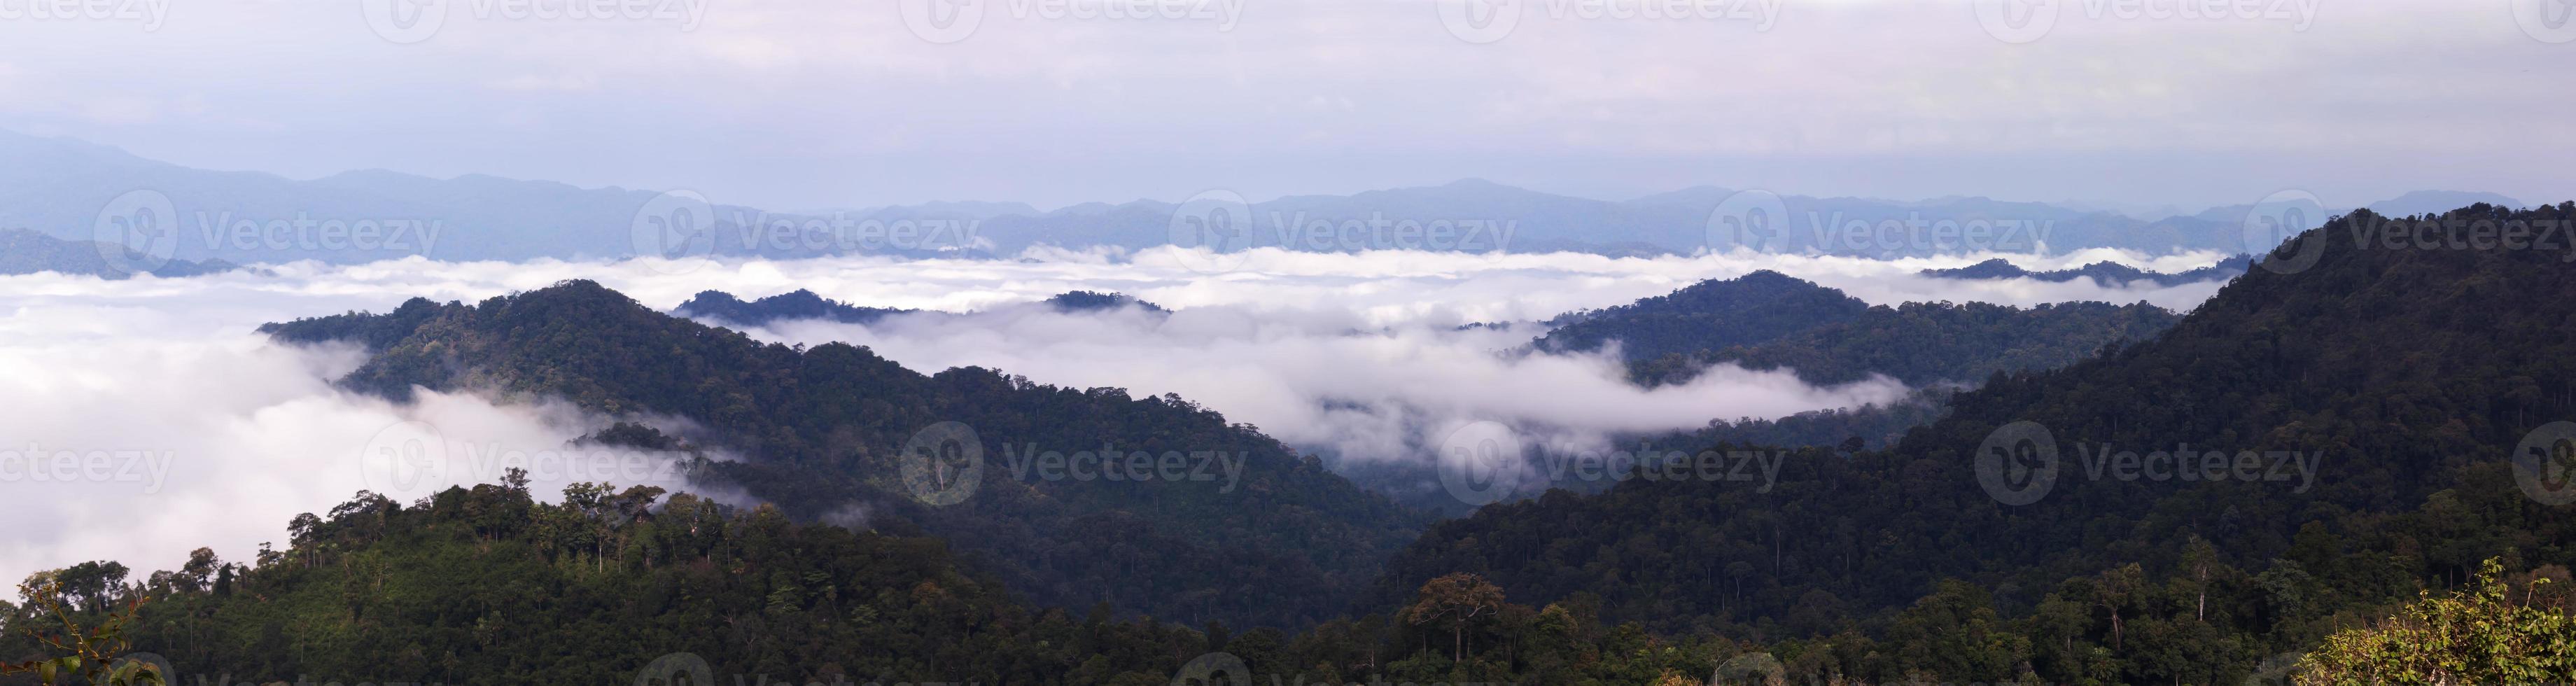 bergketens met mist in panorama foto